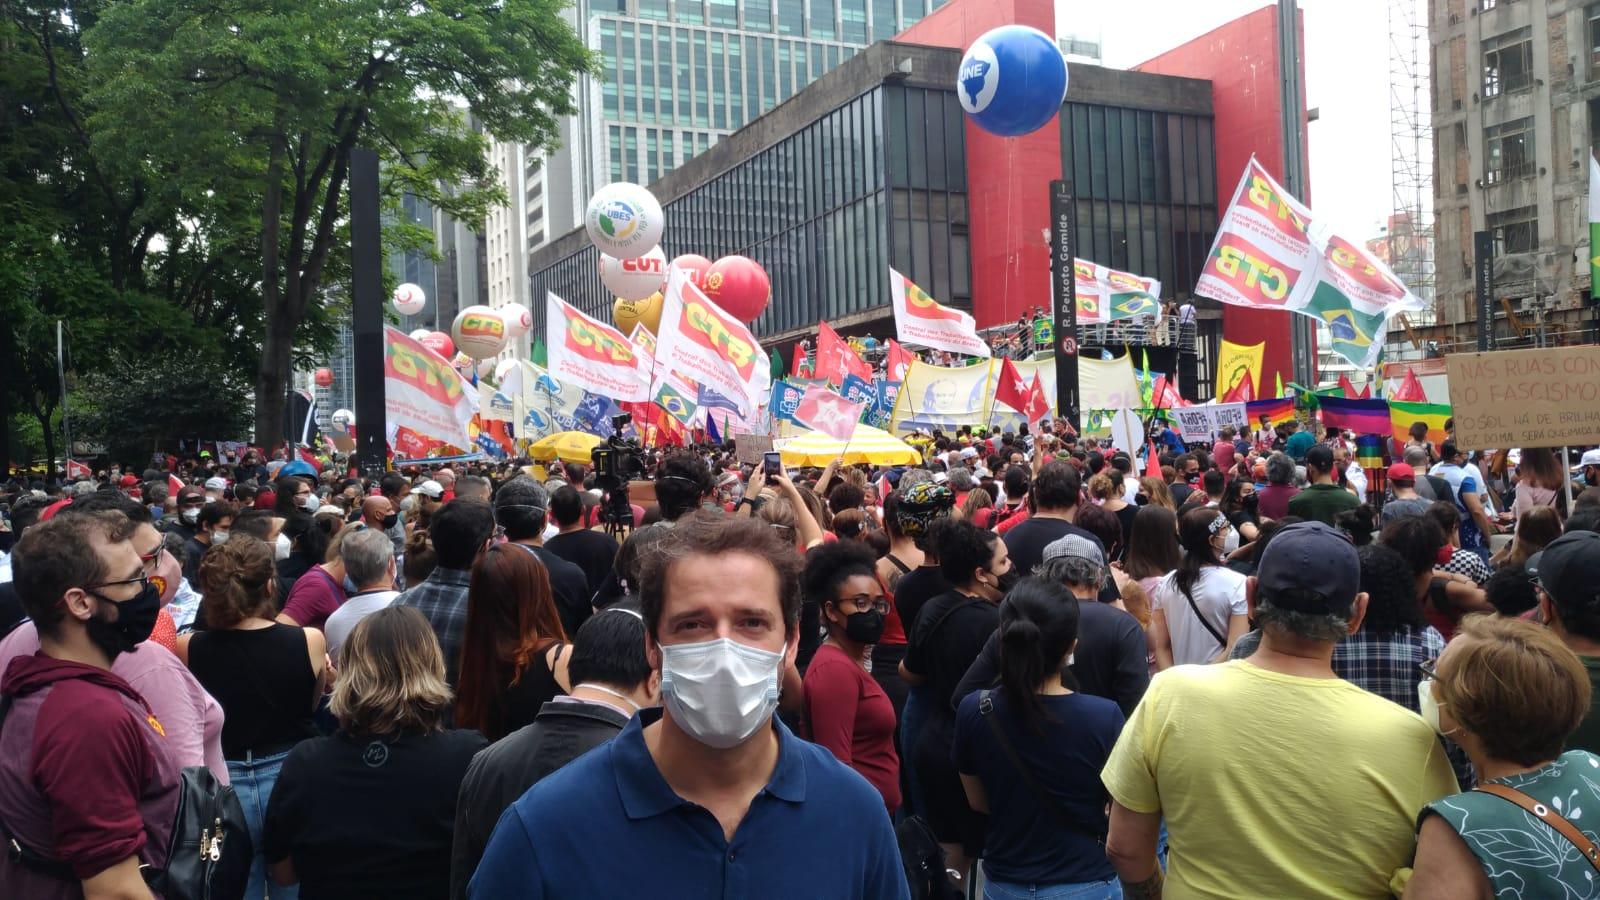 Direto da Avenida Paulista, Raul Marcelo pede impeachment de Bolsonaro #2OutForaBolsonaro